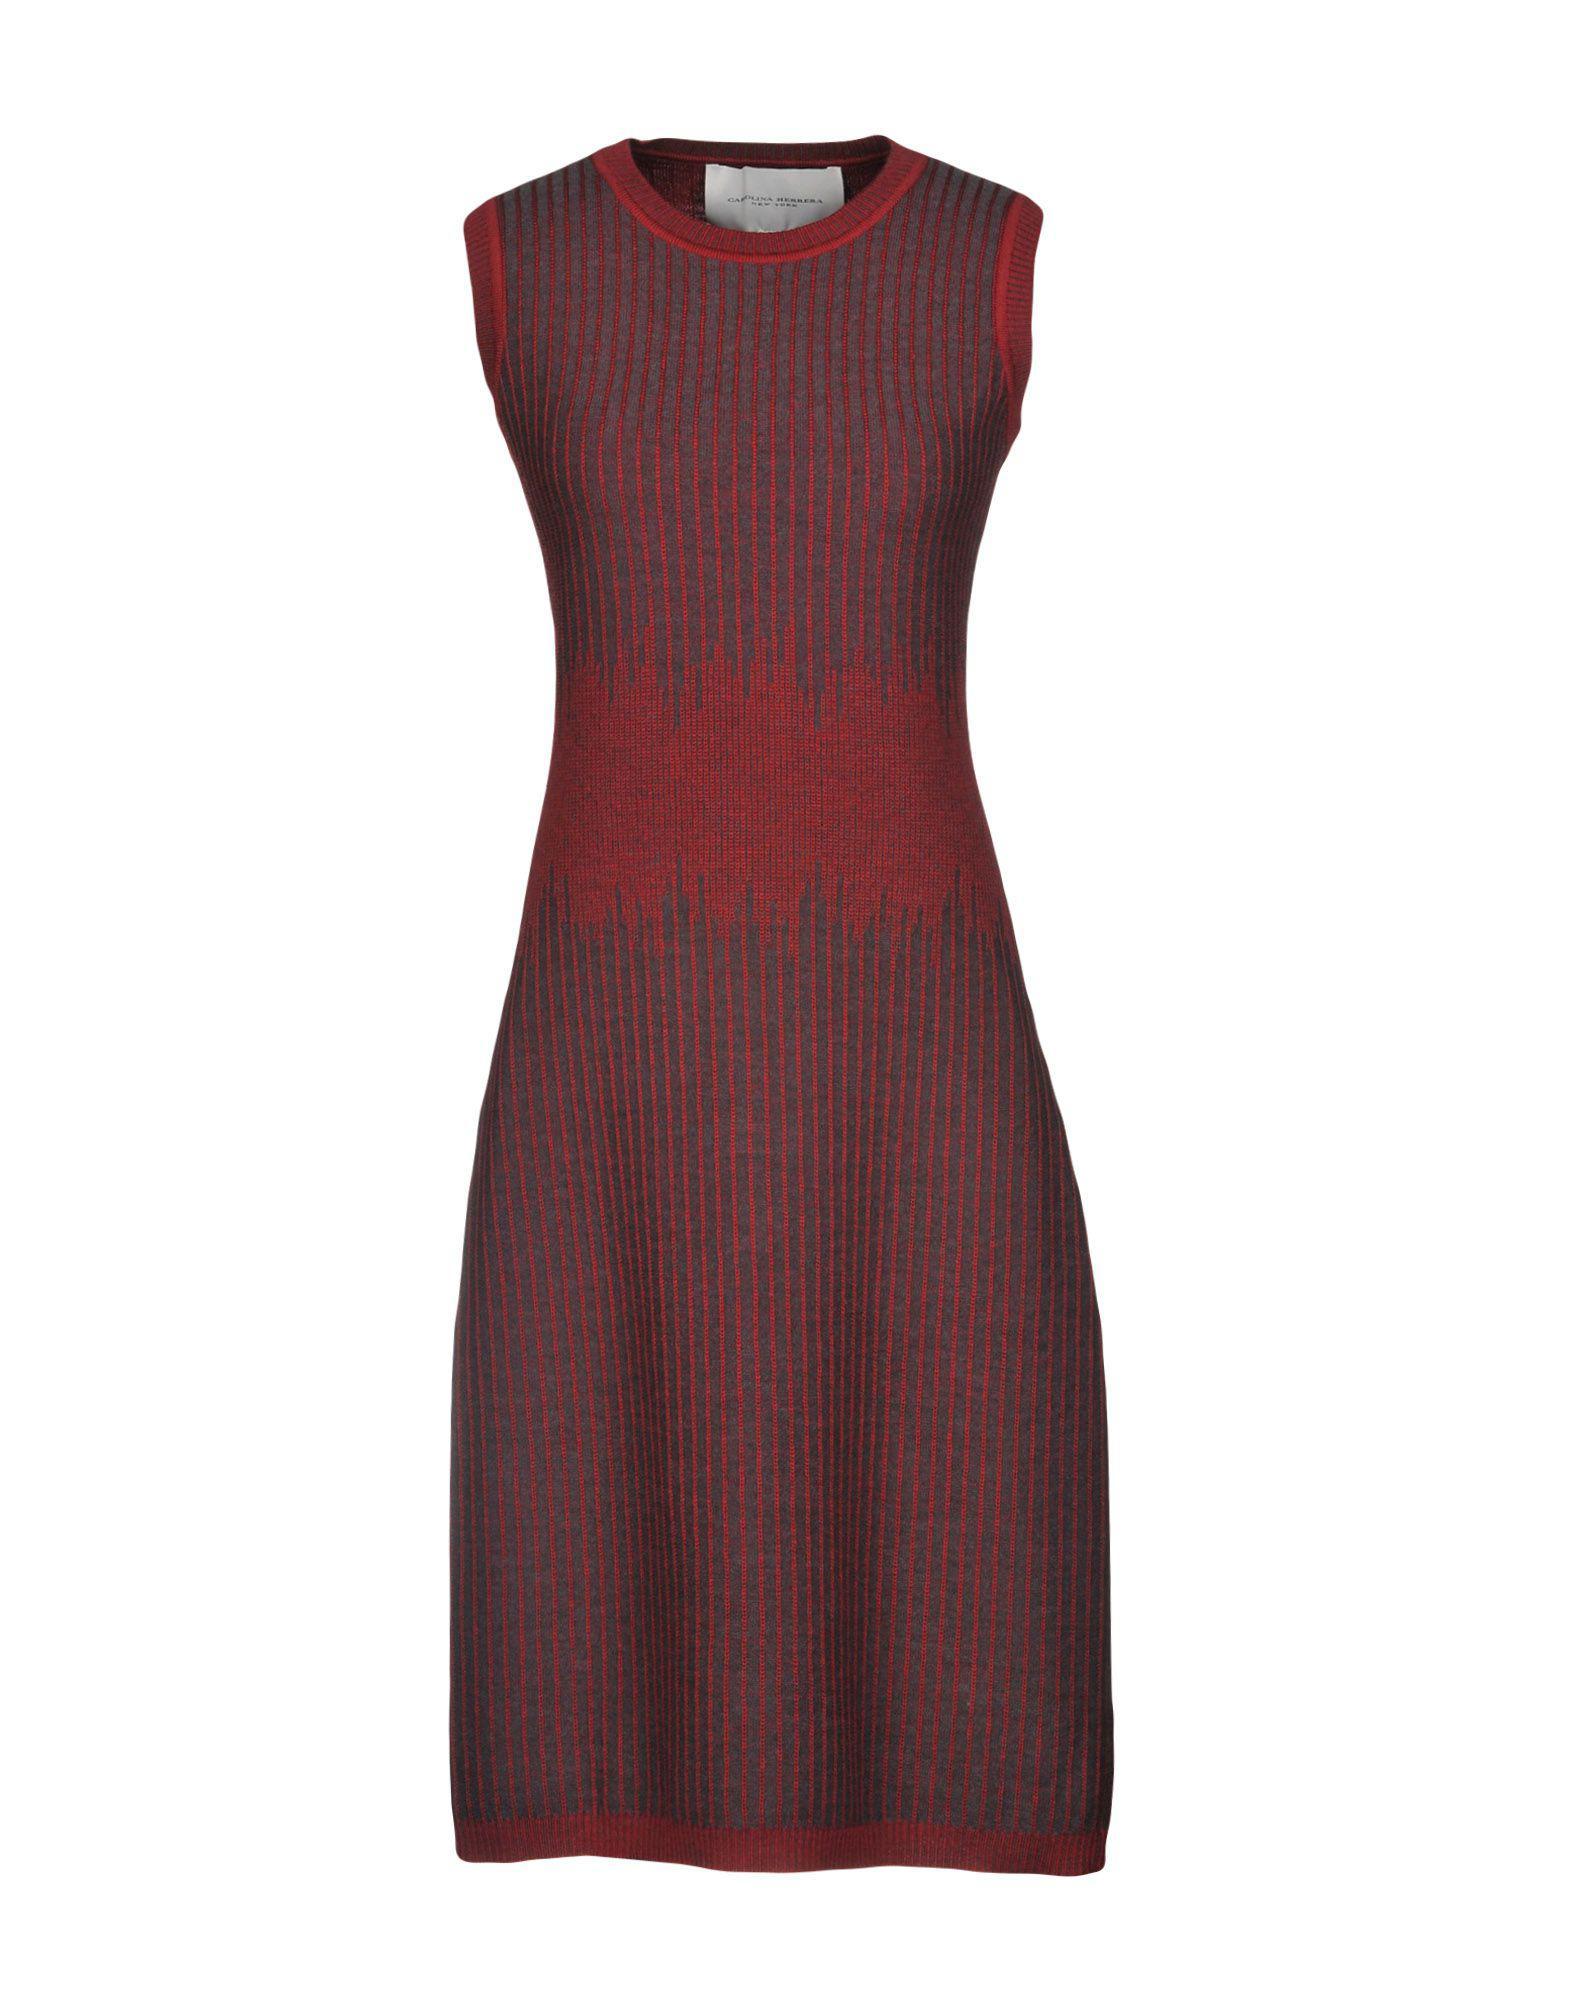 5d244d8747d Lyst - Carolina Herrera Knee-length Dress in Red